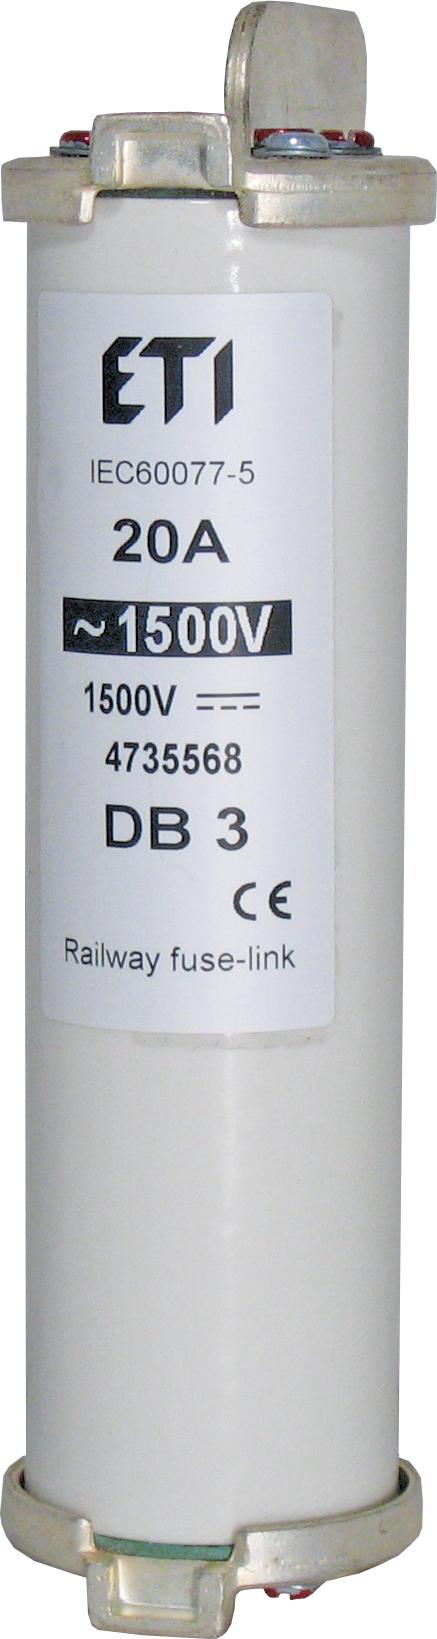 004735566